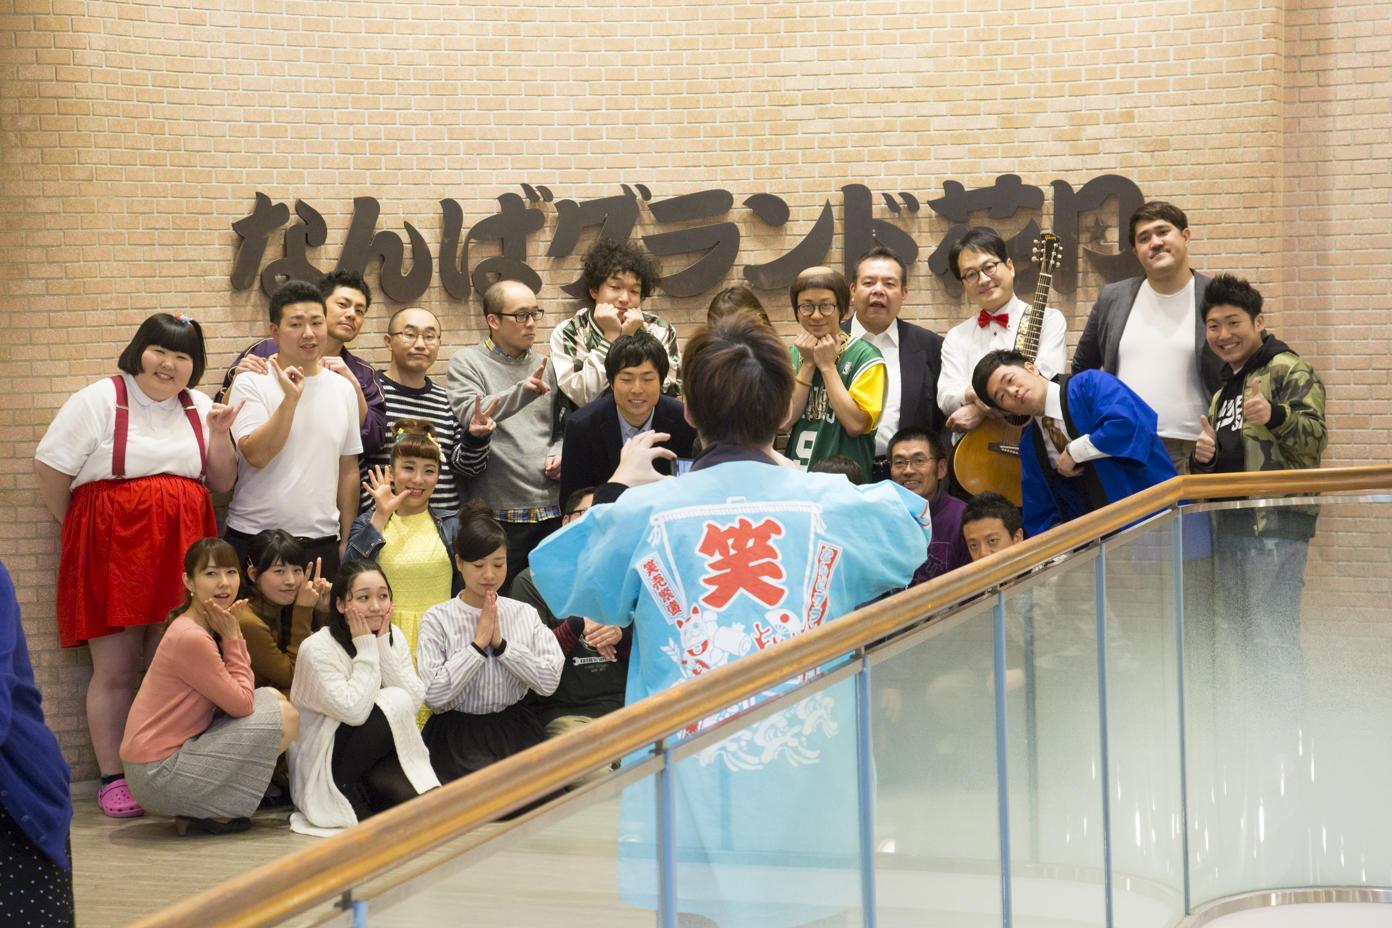 http://news.yoshimoto.co.jp/20161223232925-8027294f0f5144534fe404b9c919e2b70147c6f8.jpg